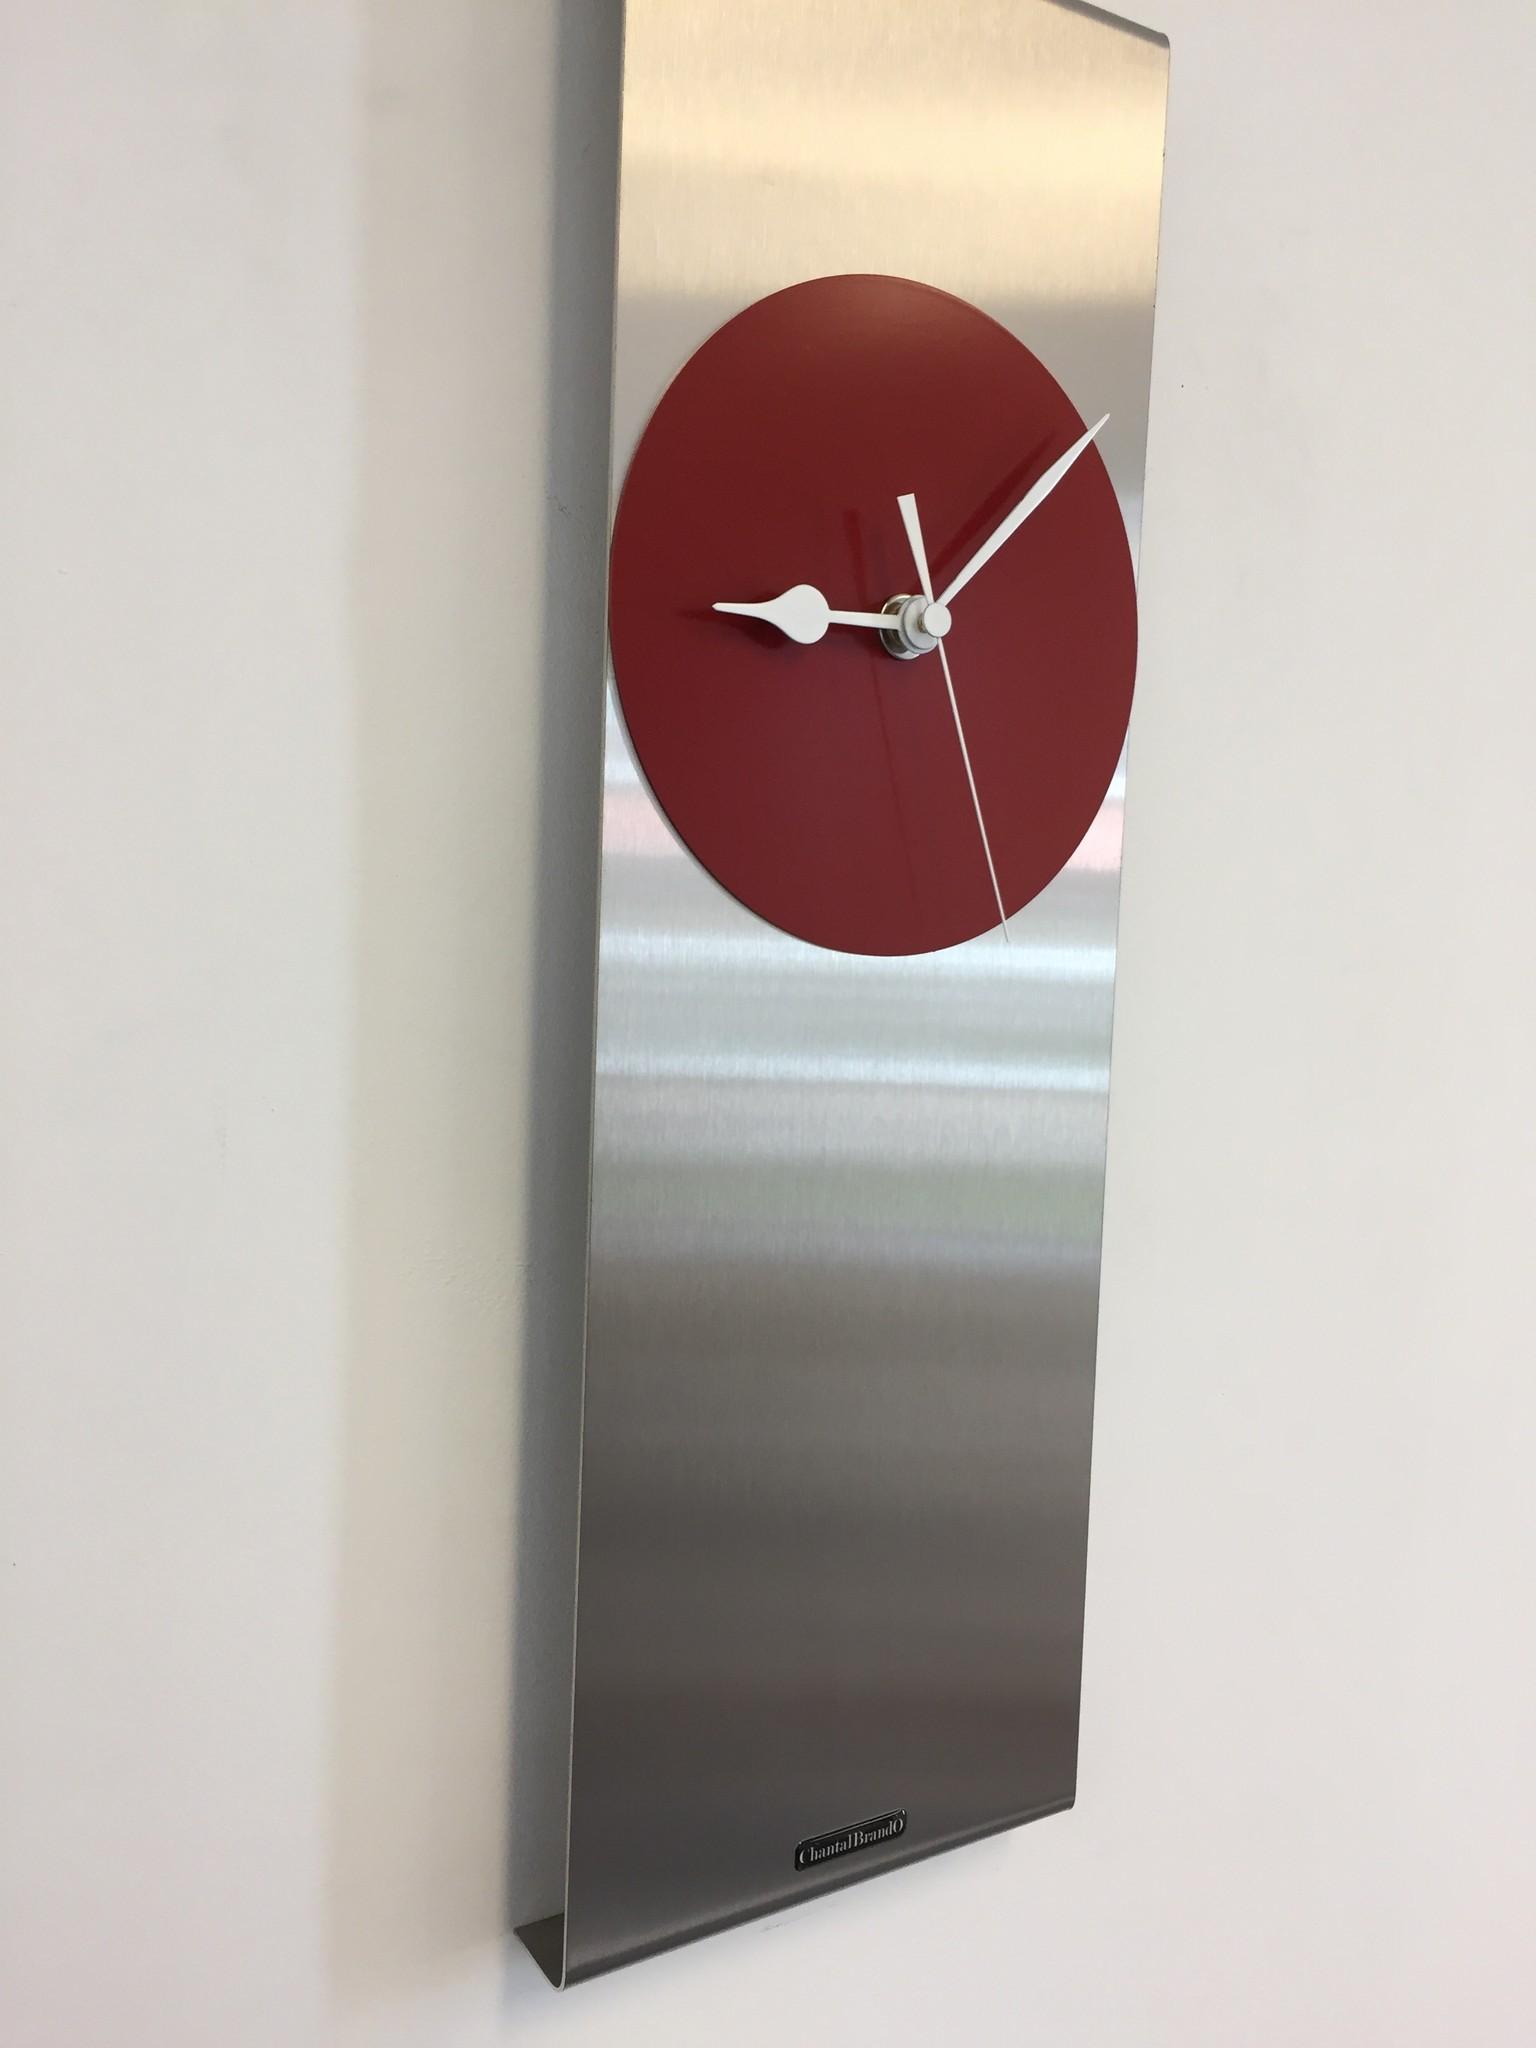 ChantalBrandO Wandklok Cassiopee RED Modern Dutch Design